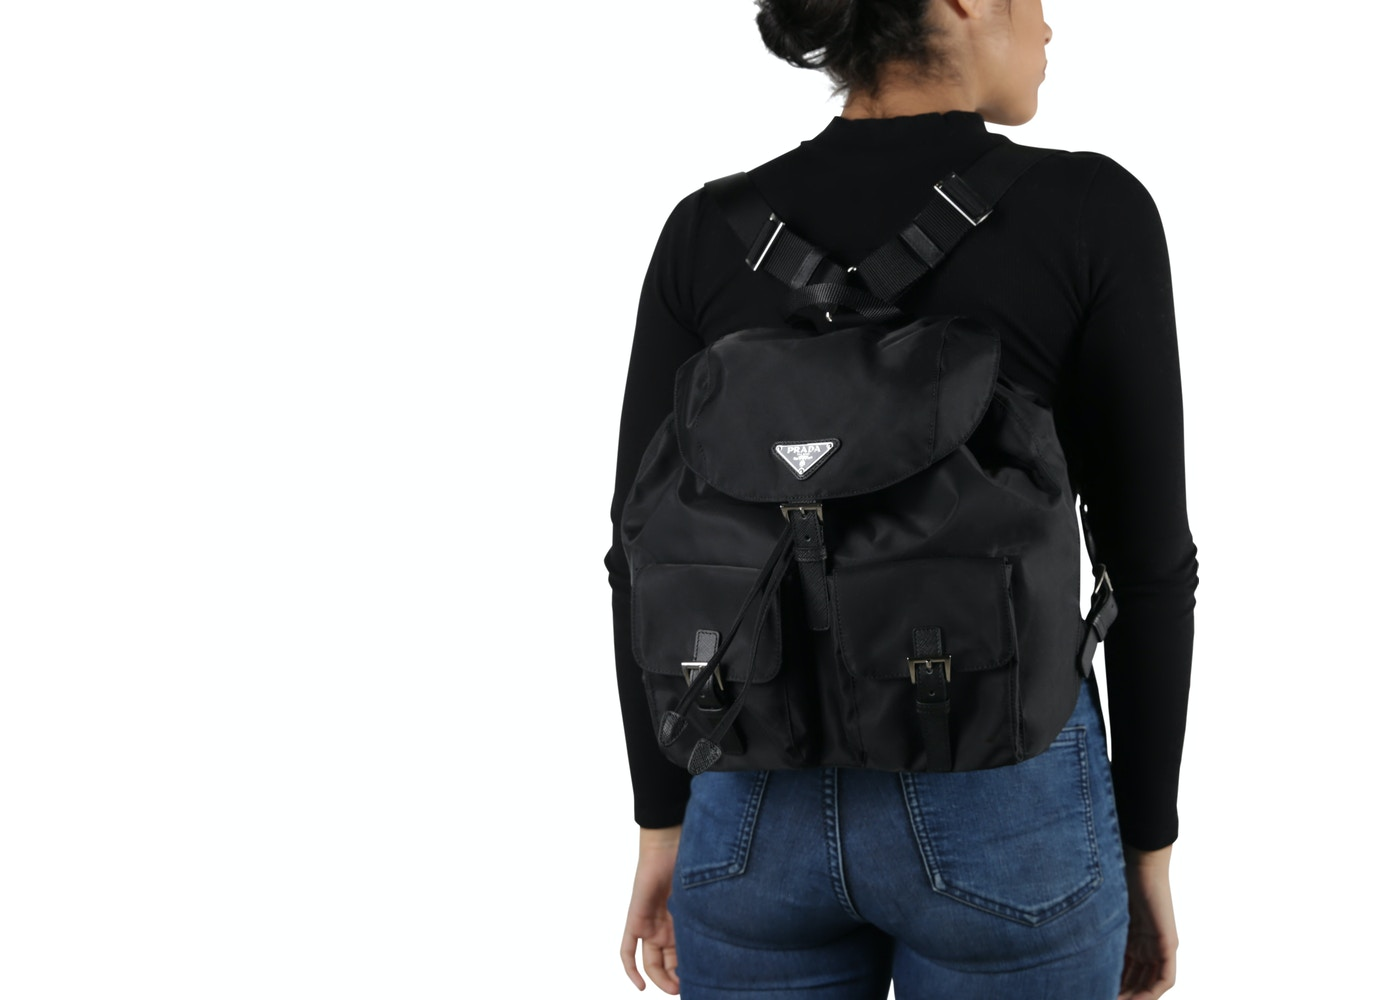 05027cbe259d0b Prada Vela Backpack Nero Black